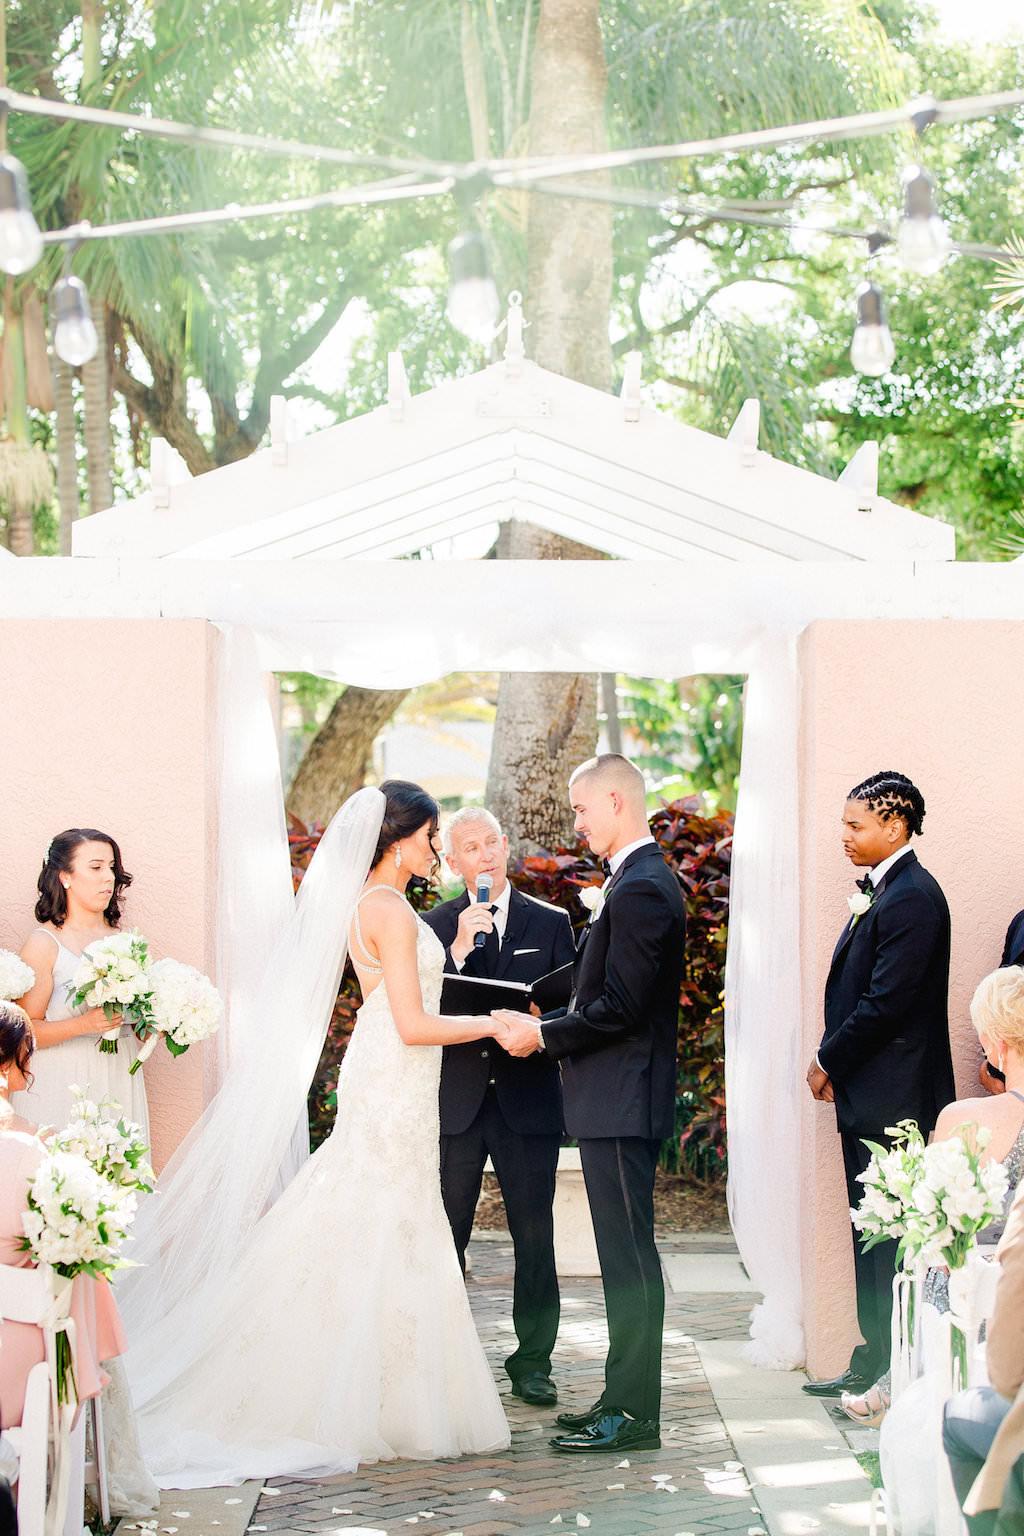 Outdoor Bride and Groom Wedding Ceremony Portrait   Tampa Bay Wedding Photographer Ailyn La Torre   Venue The Vinoy Renaissance St. Petersburg Resort & Golf Clubl